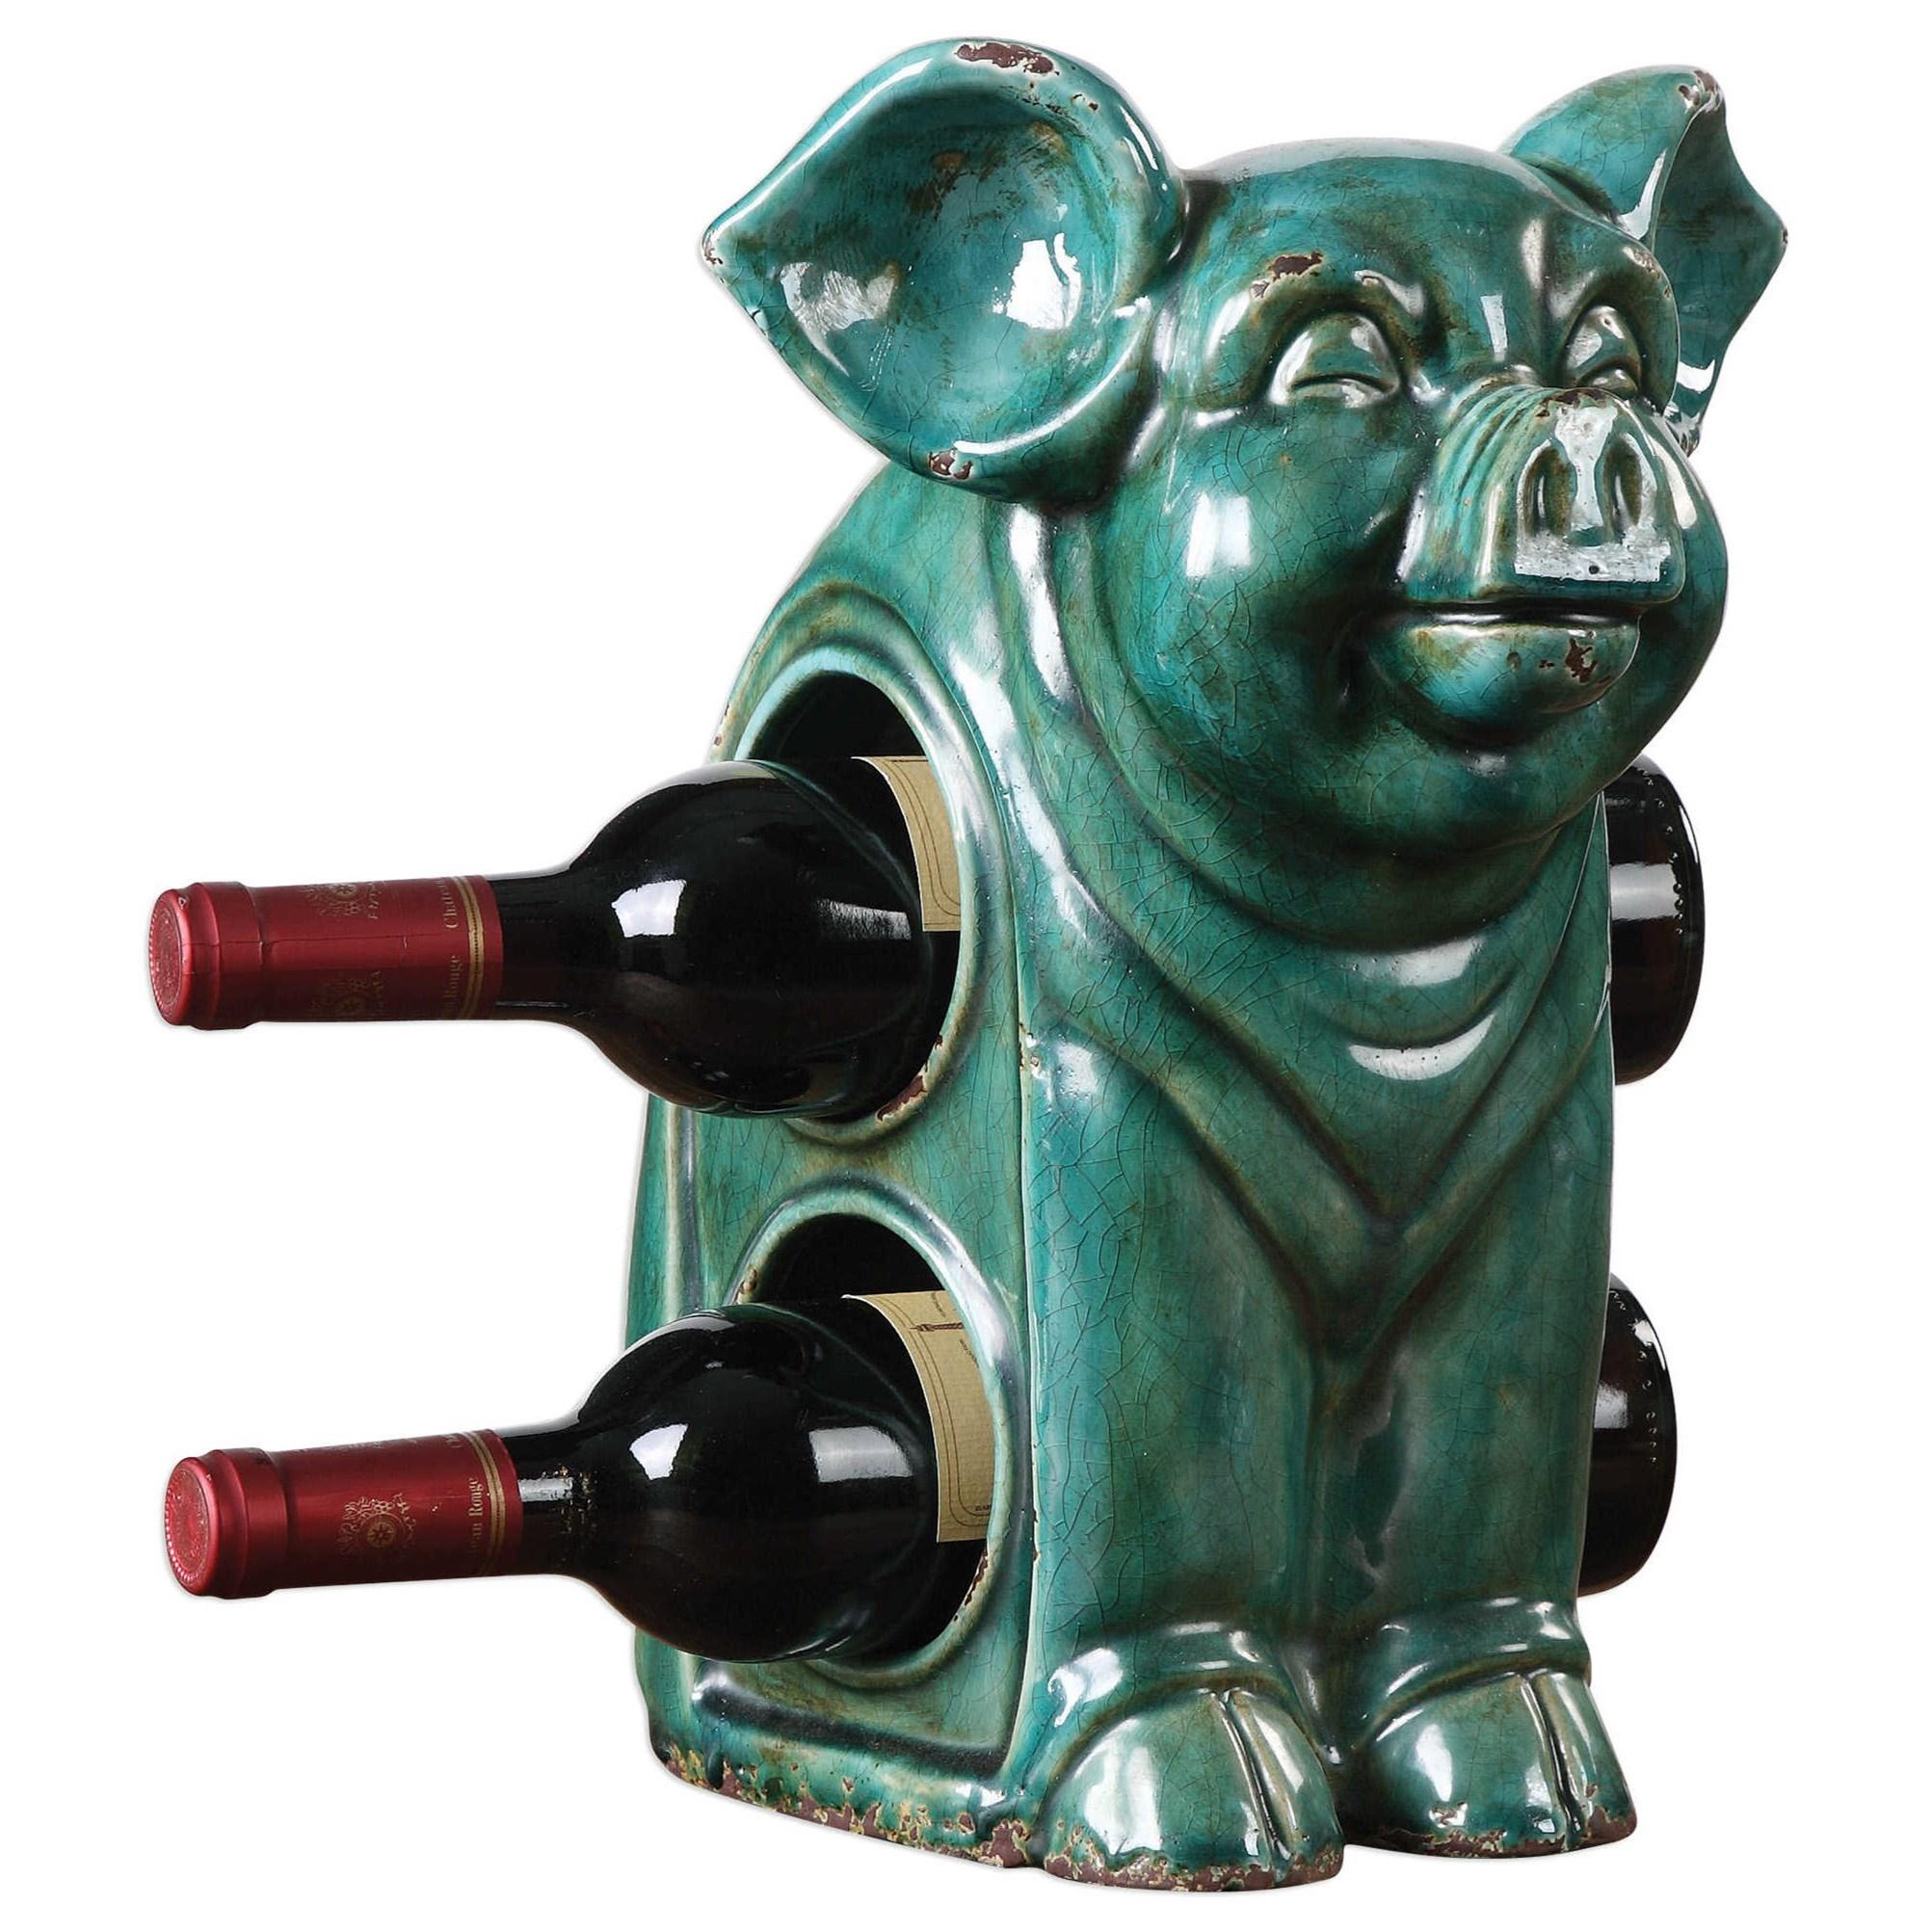 Uttermost Accessories Oink Ceramic Wine Holder - Item Number: 18757